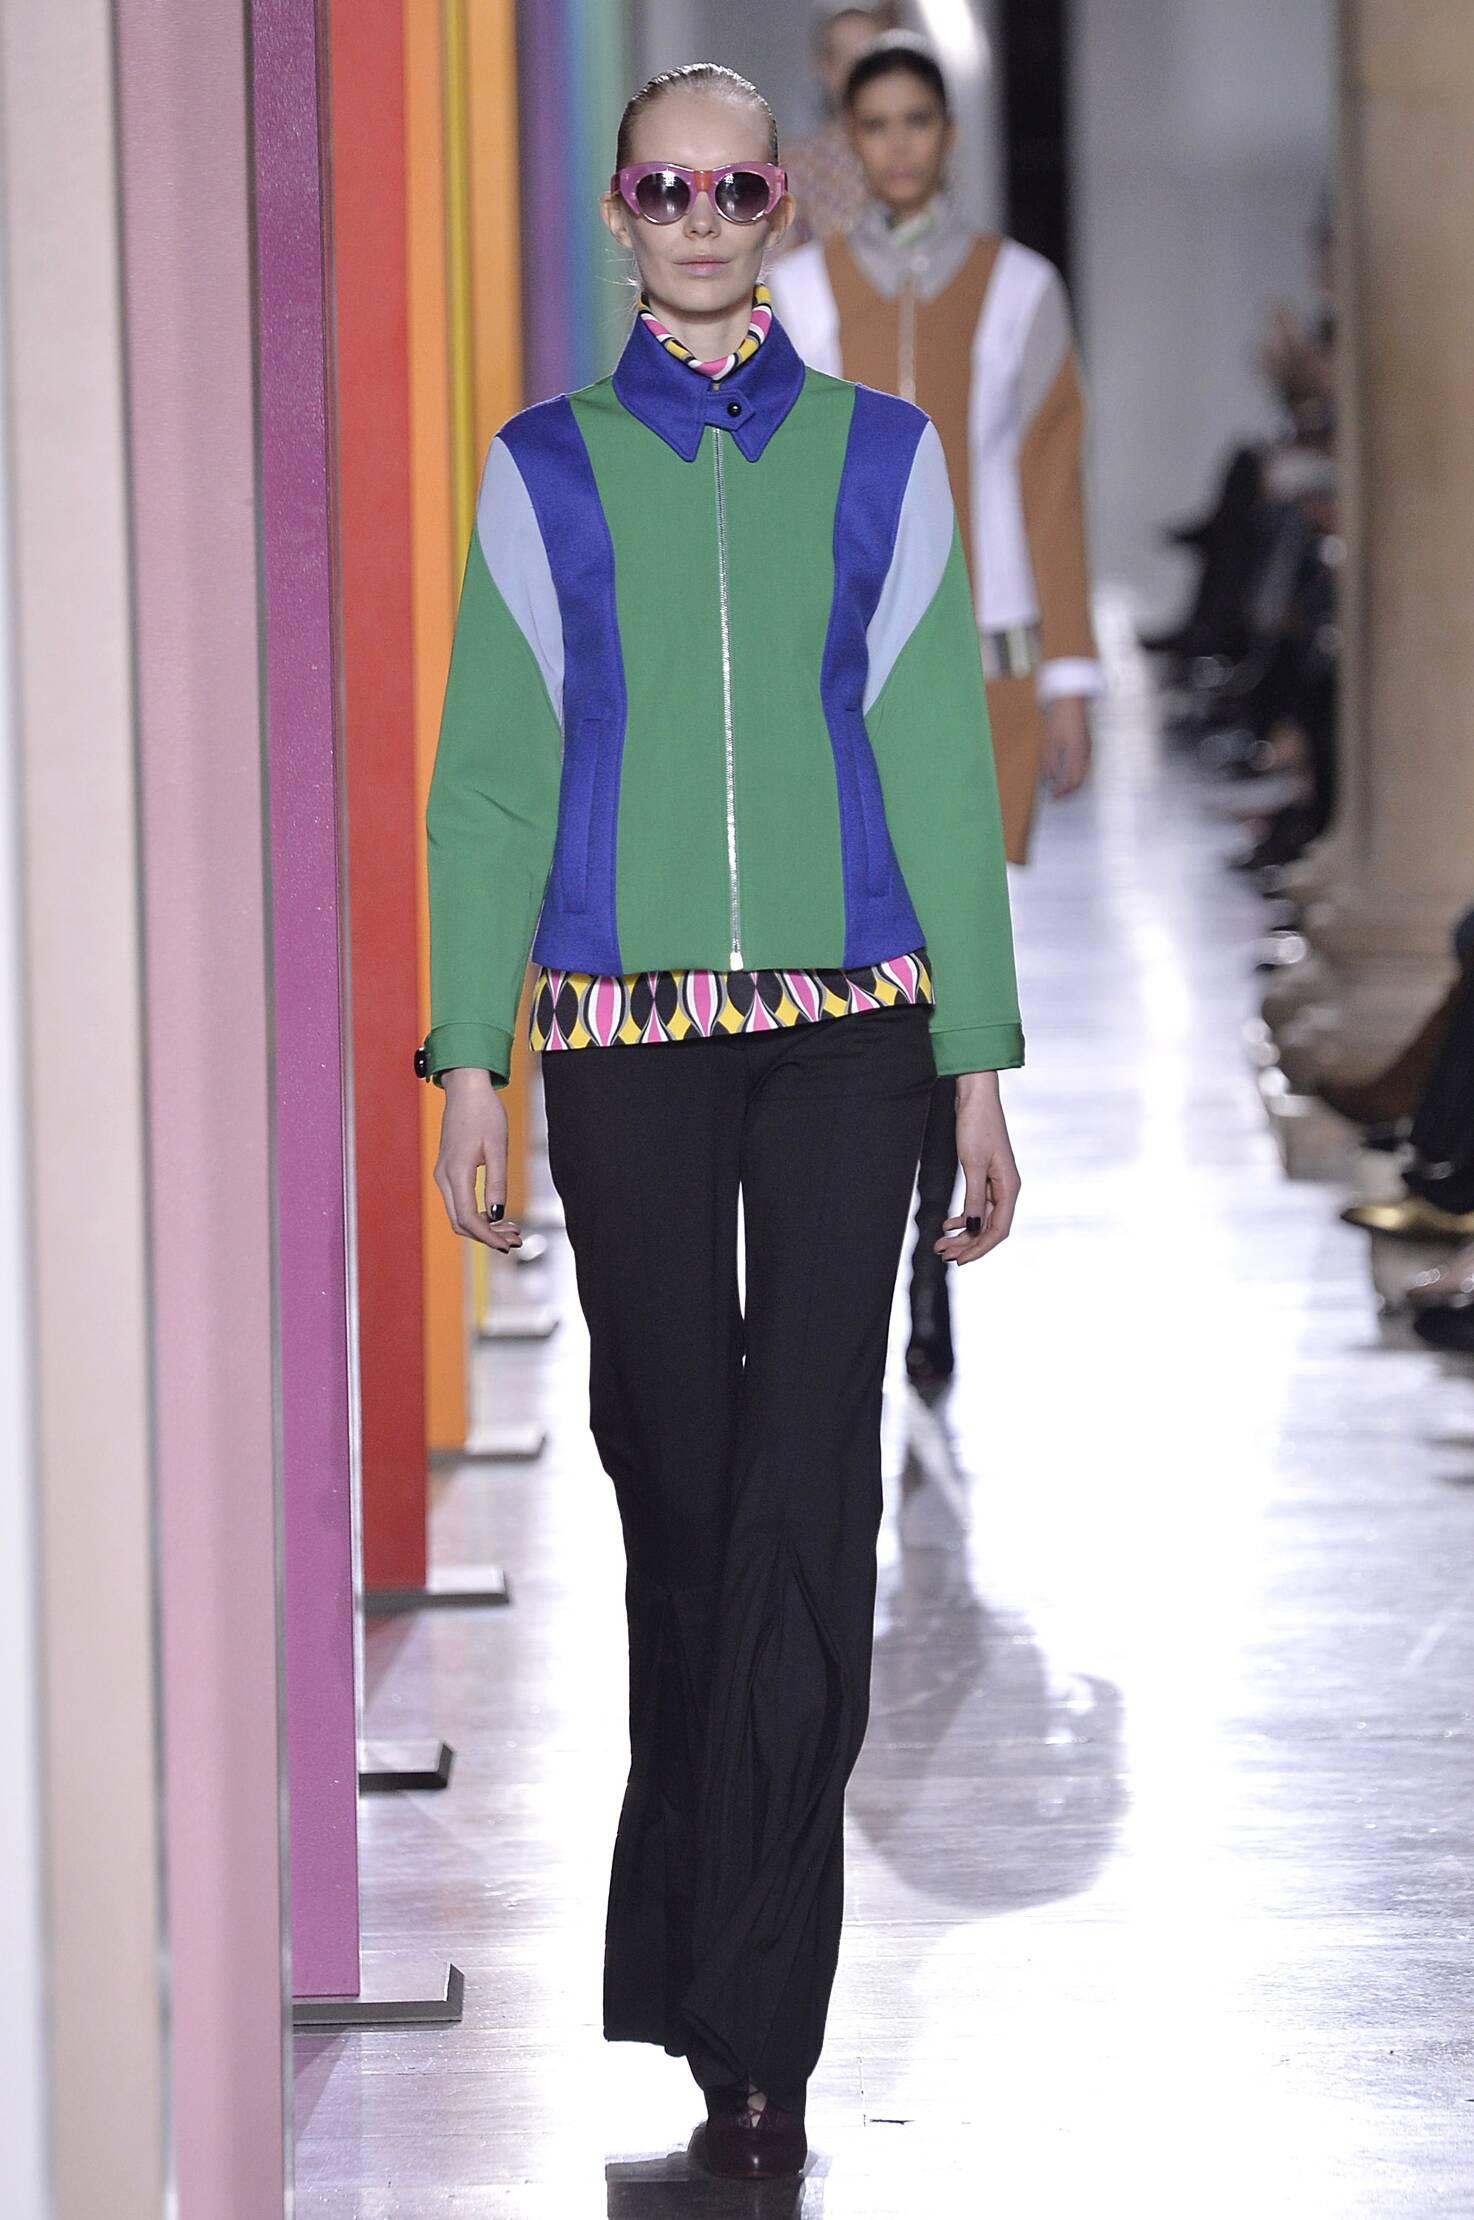 Catwalk Jonathan Saunders Womenswear Collection Winter 2015